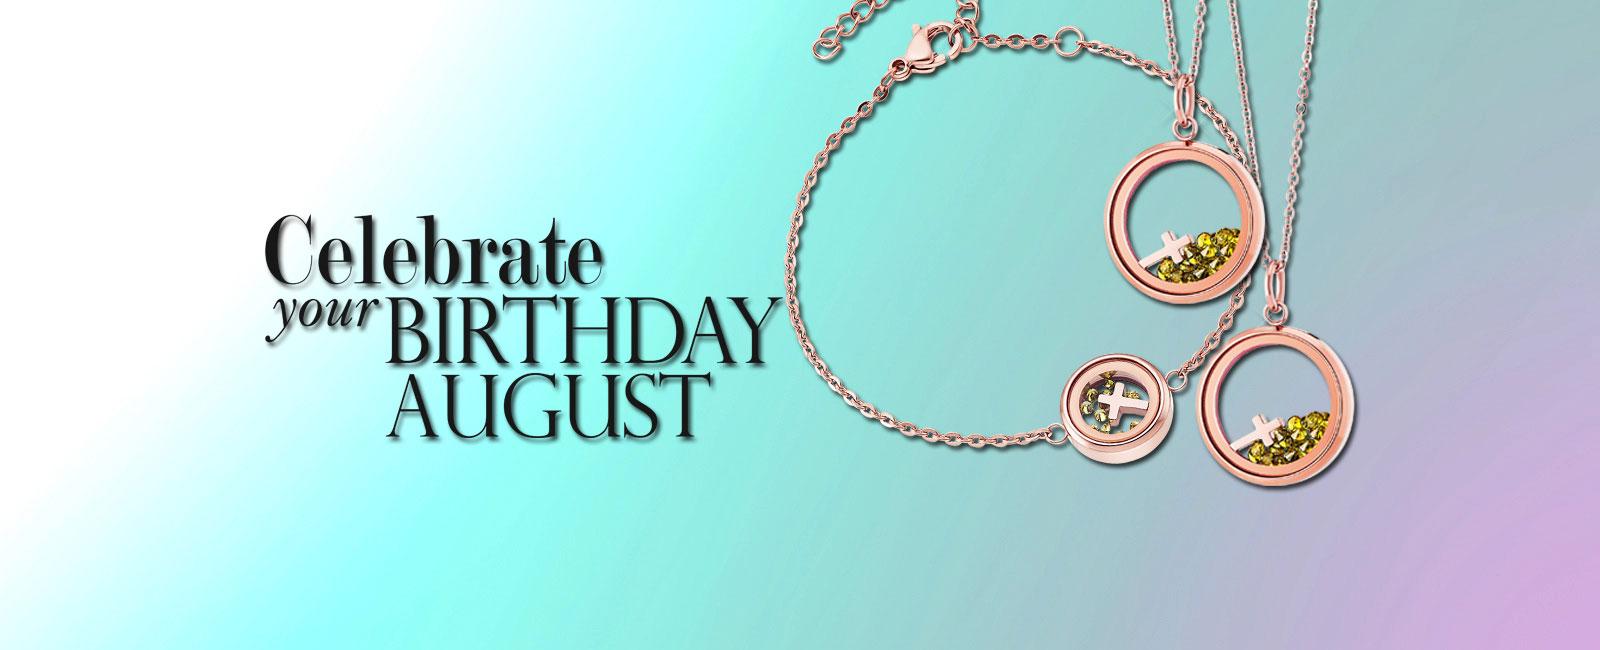 Birthday Stones August - Loisir